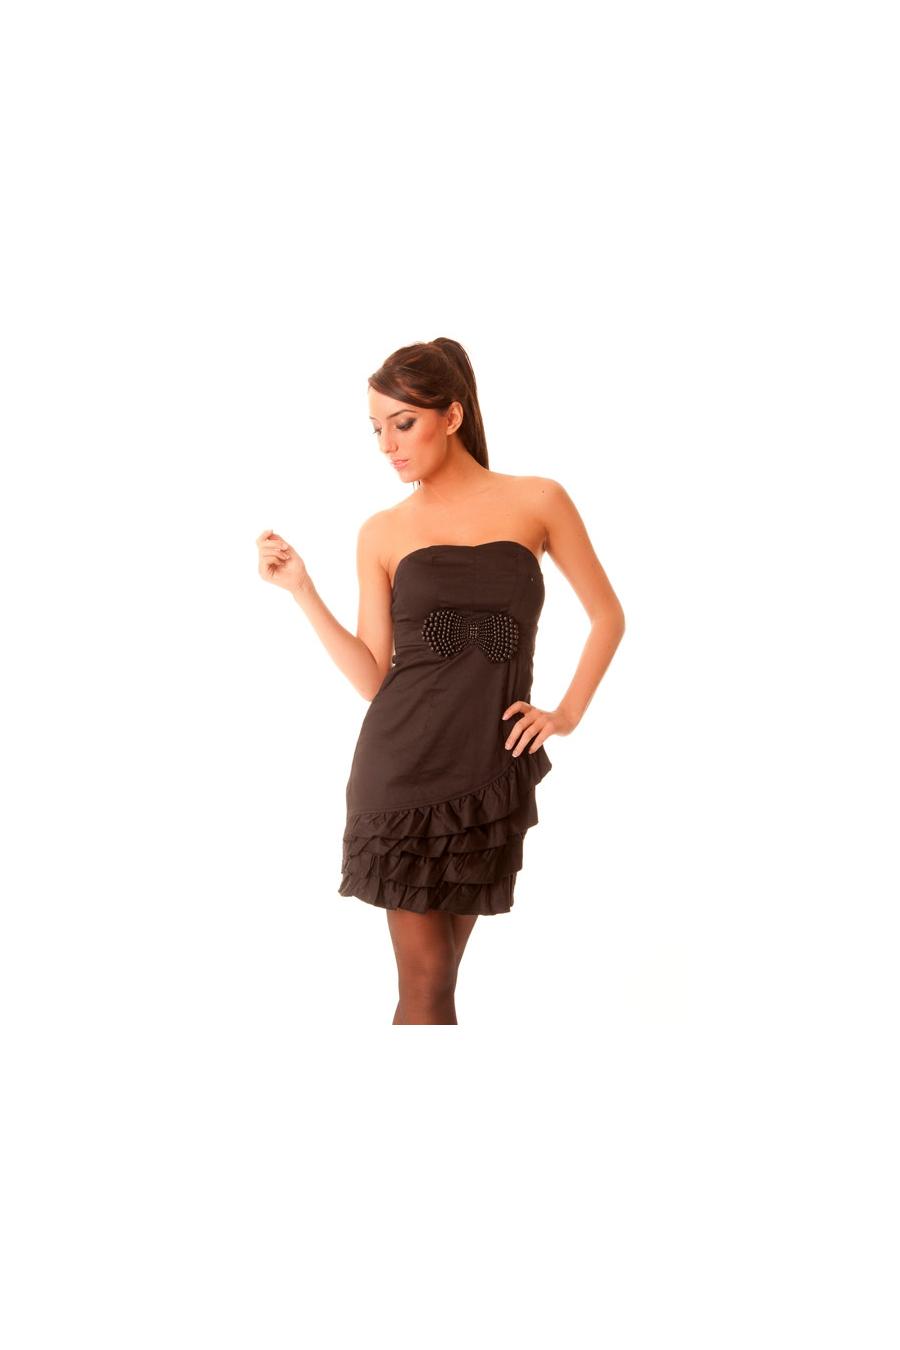 Robe noir avec noeud papillon en perles. 906